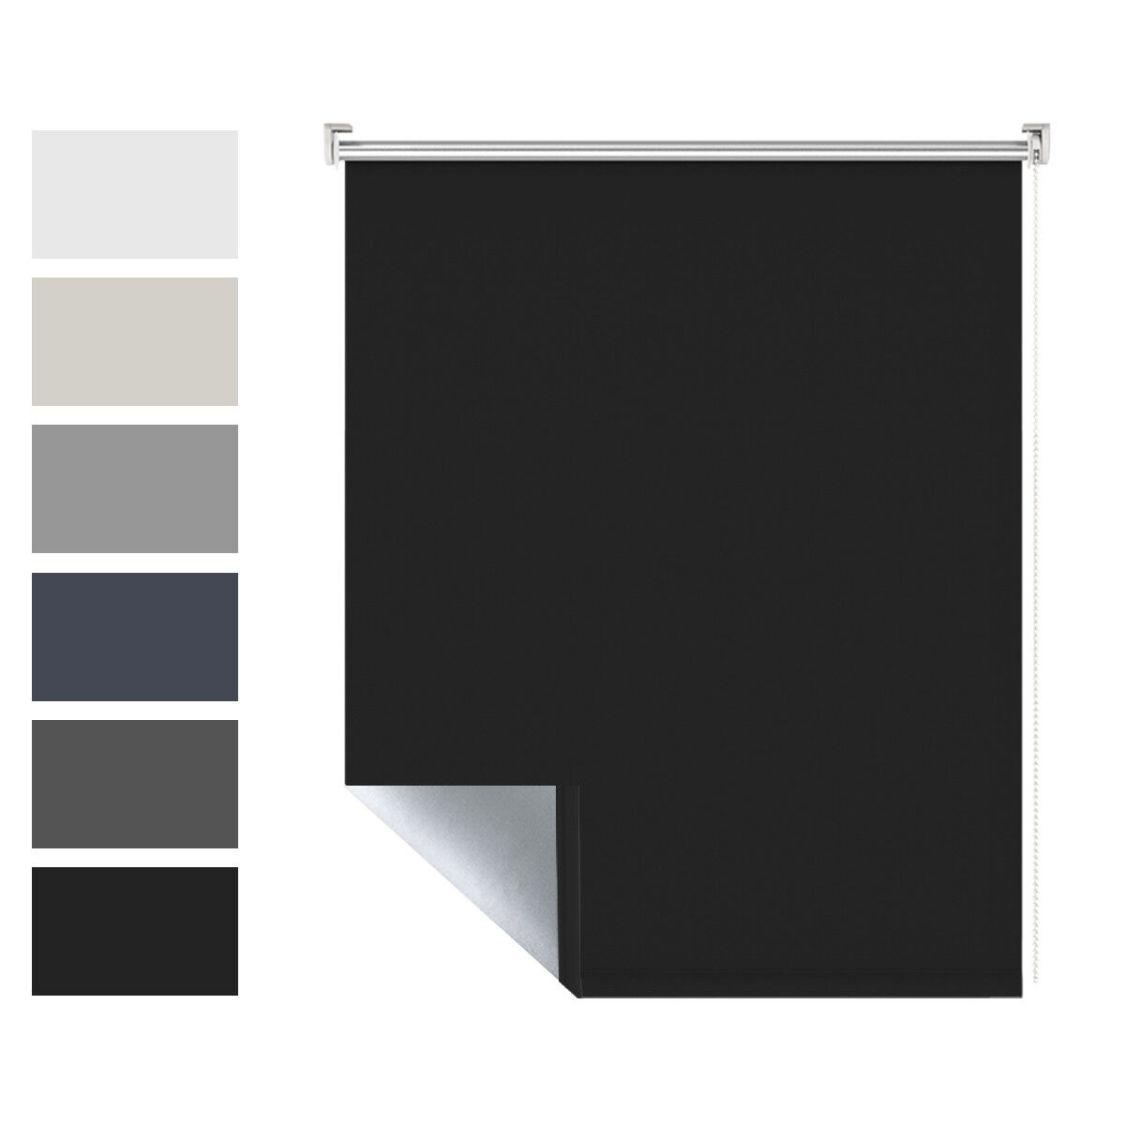 Fensterrollo Klemmfix verdunkelungsrollo ohne Bohren Sonnenschutz Rollos